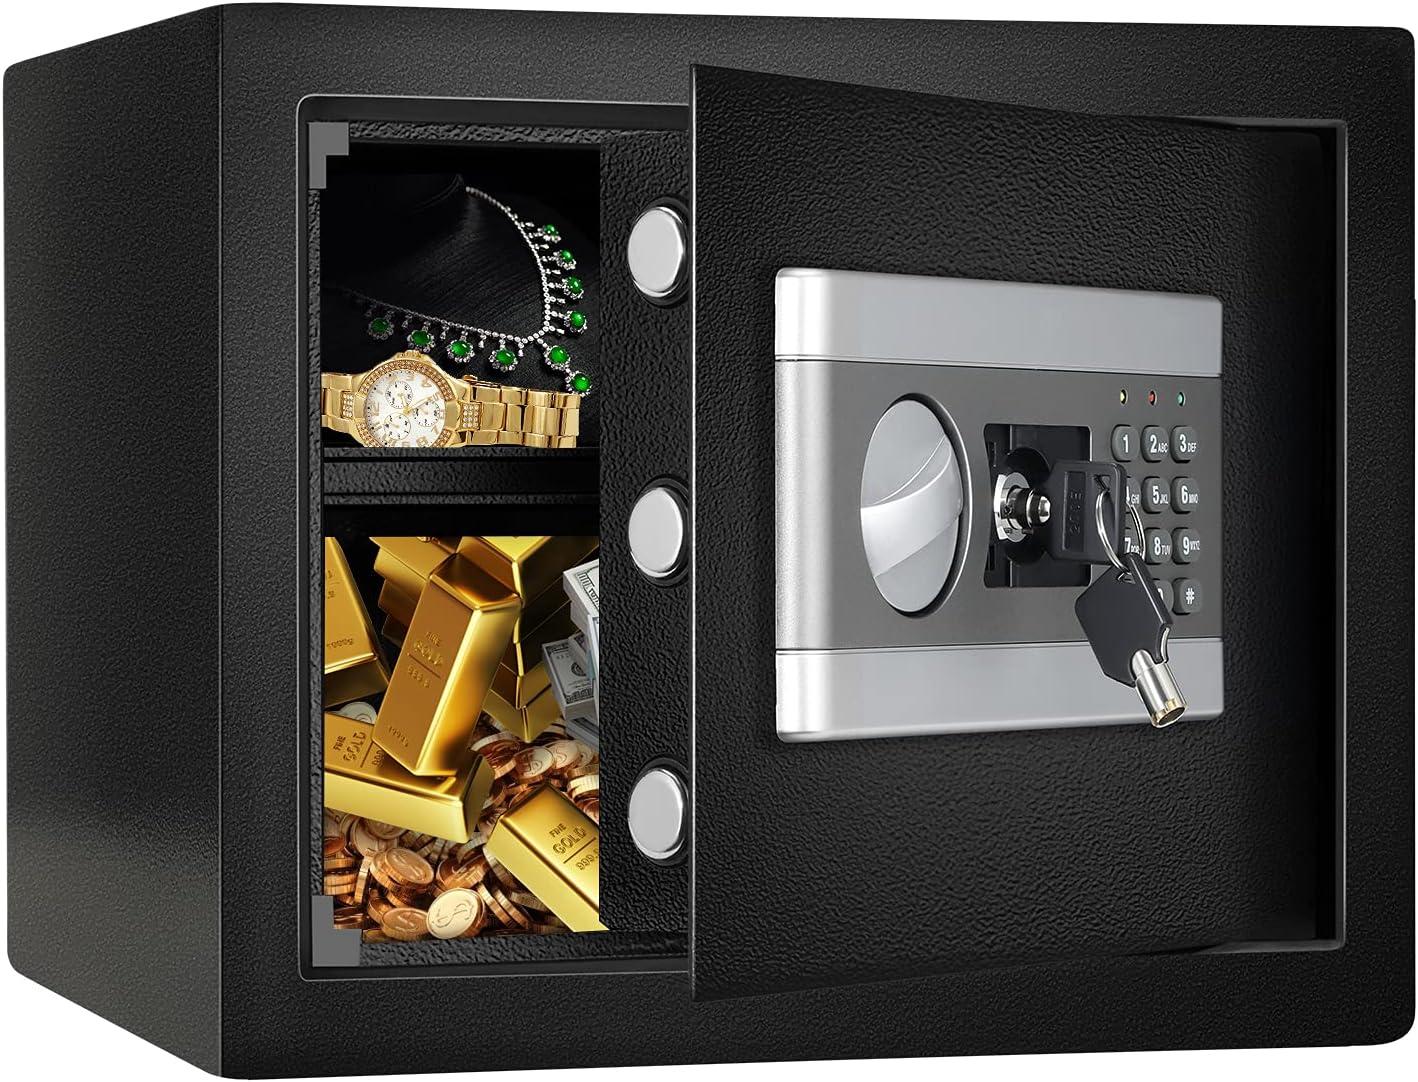 1.0 Cub Fireproof Safe Cabinet Security Box, Digital Combination Lock Safe with Keypad LED Indicator, for Cash Money Jewelry Guns Cabinet (Black)